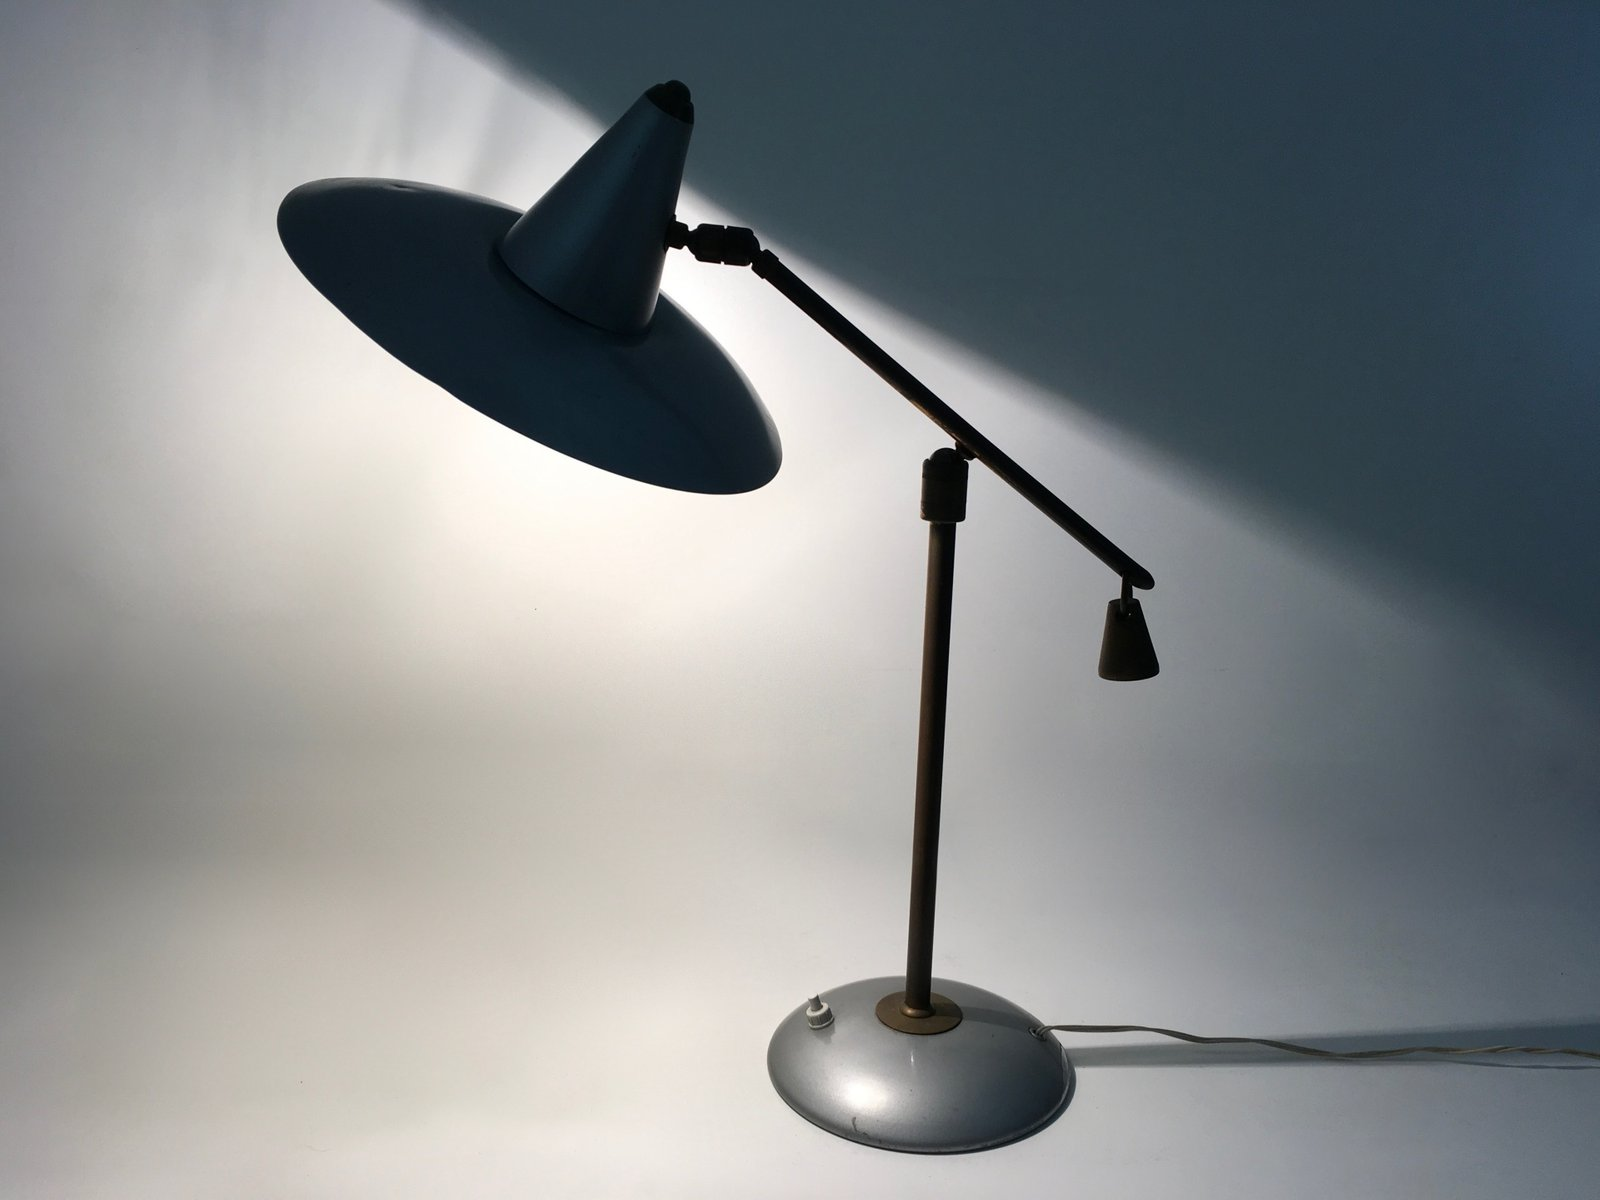 tischlampe aus messing lackiertem metall 1950er bei. Black Bedroom Furniture Sets. Home Design Ideas